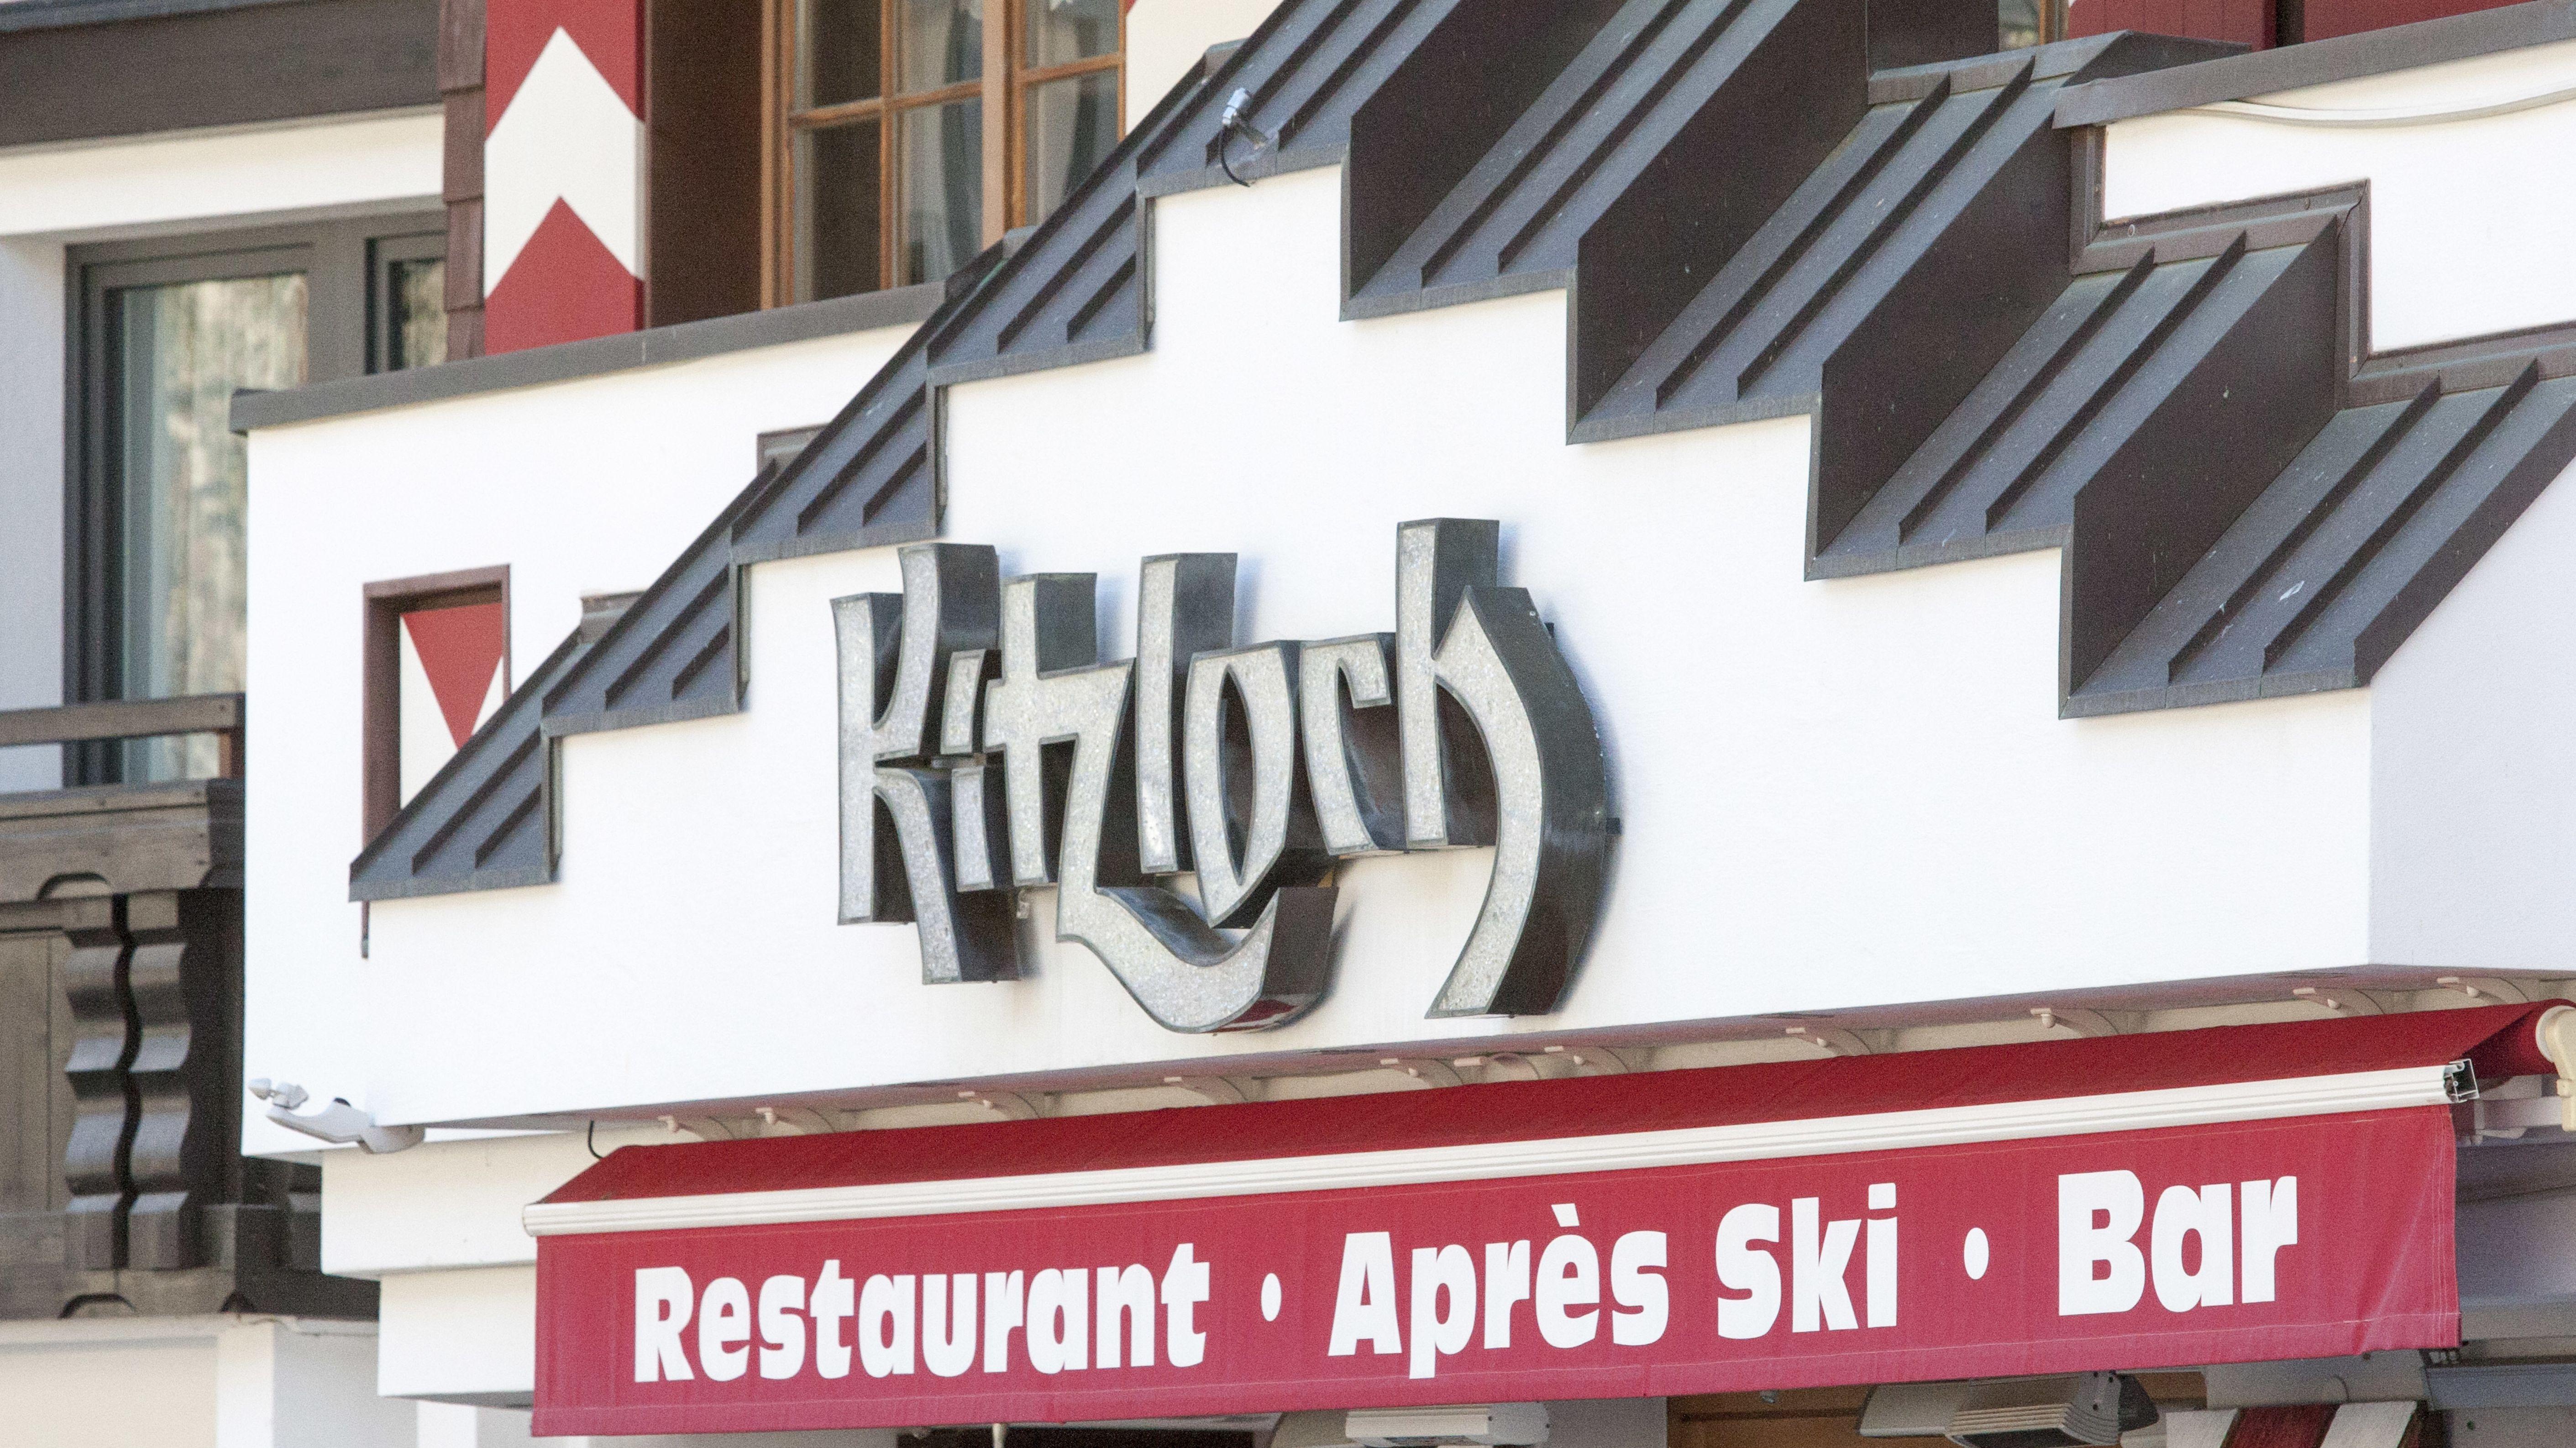 Apres Ski - Bar in Ischgl